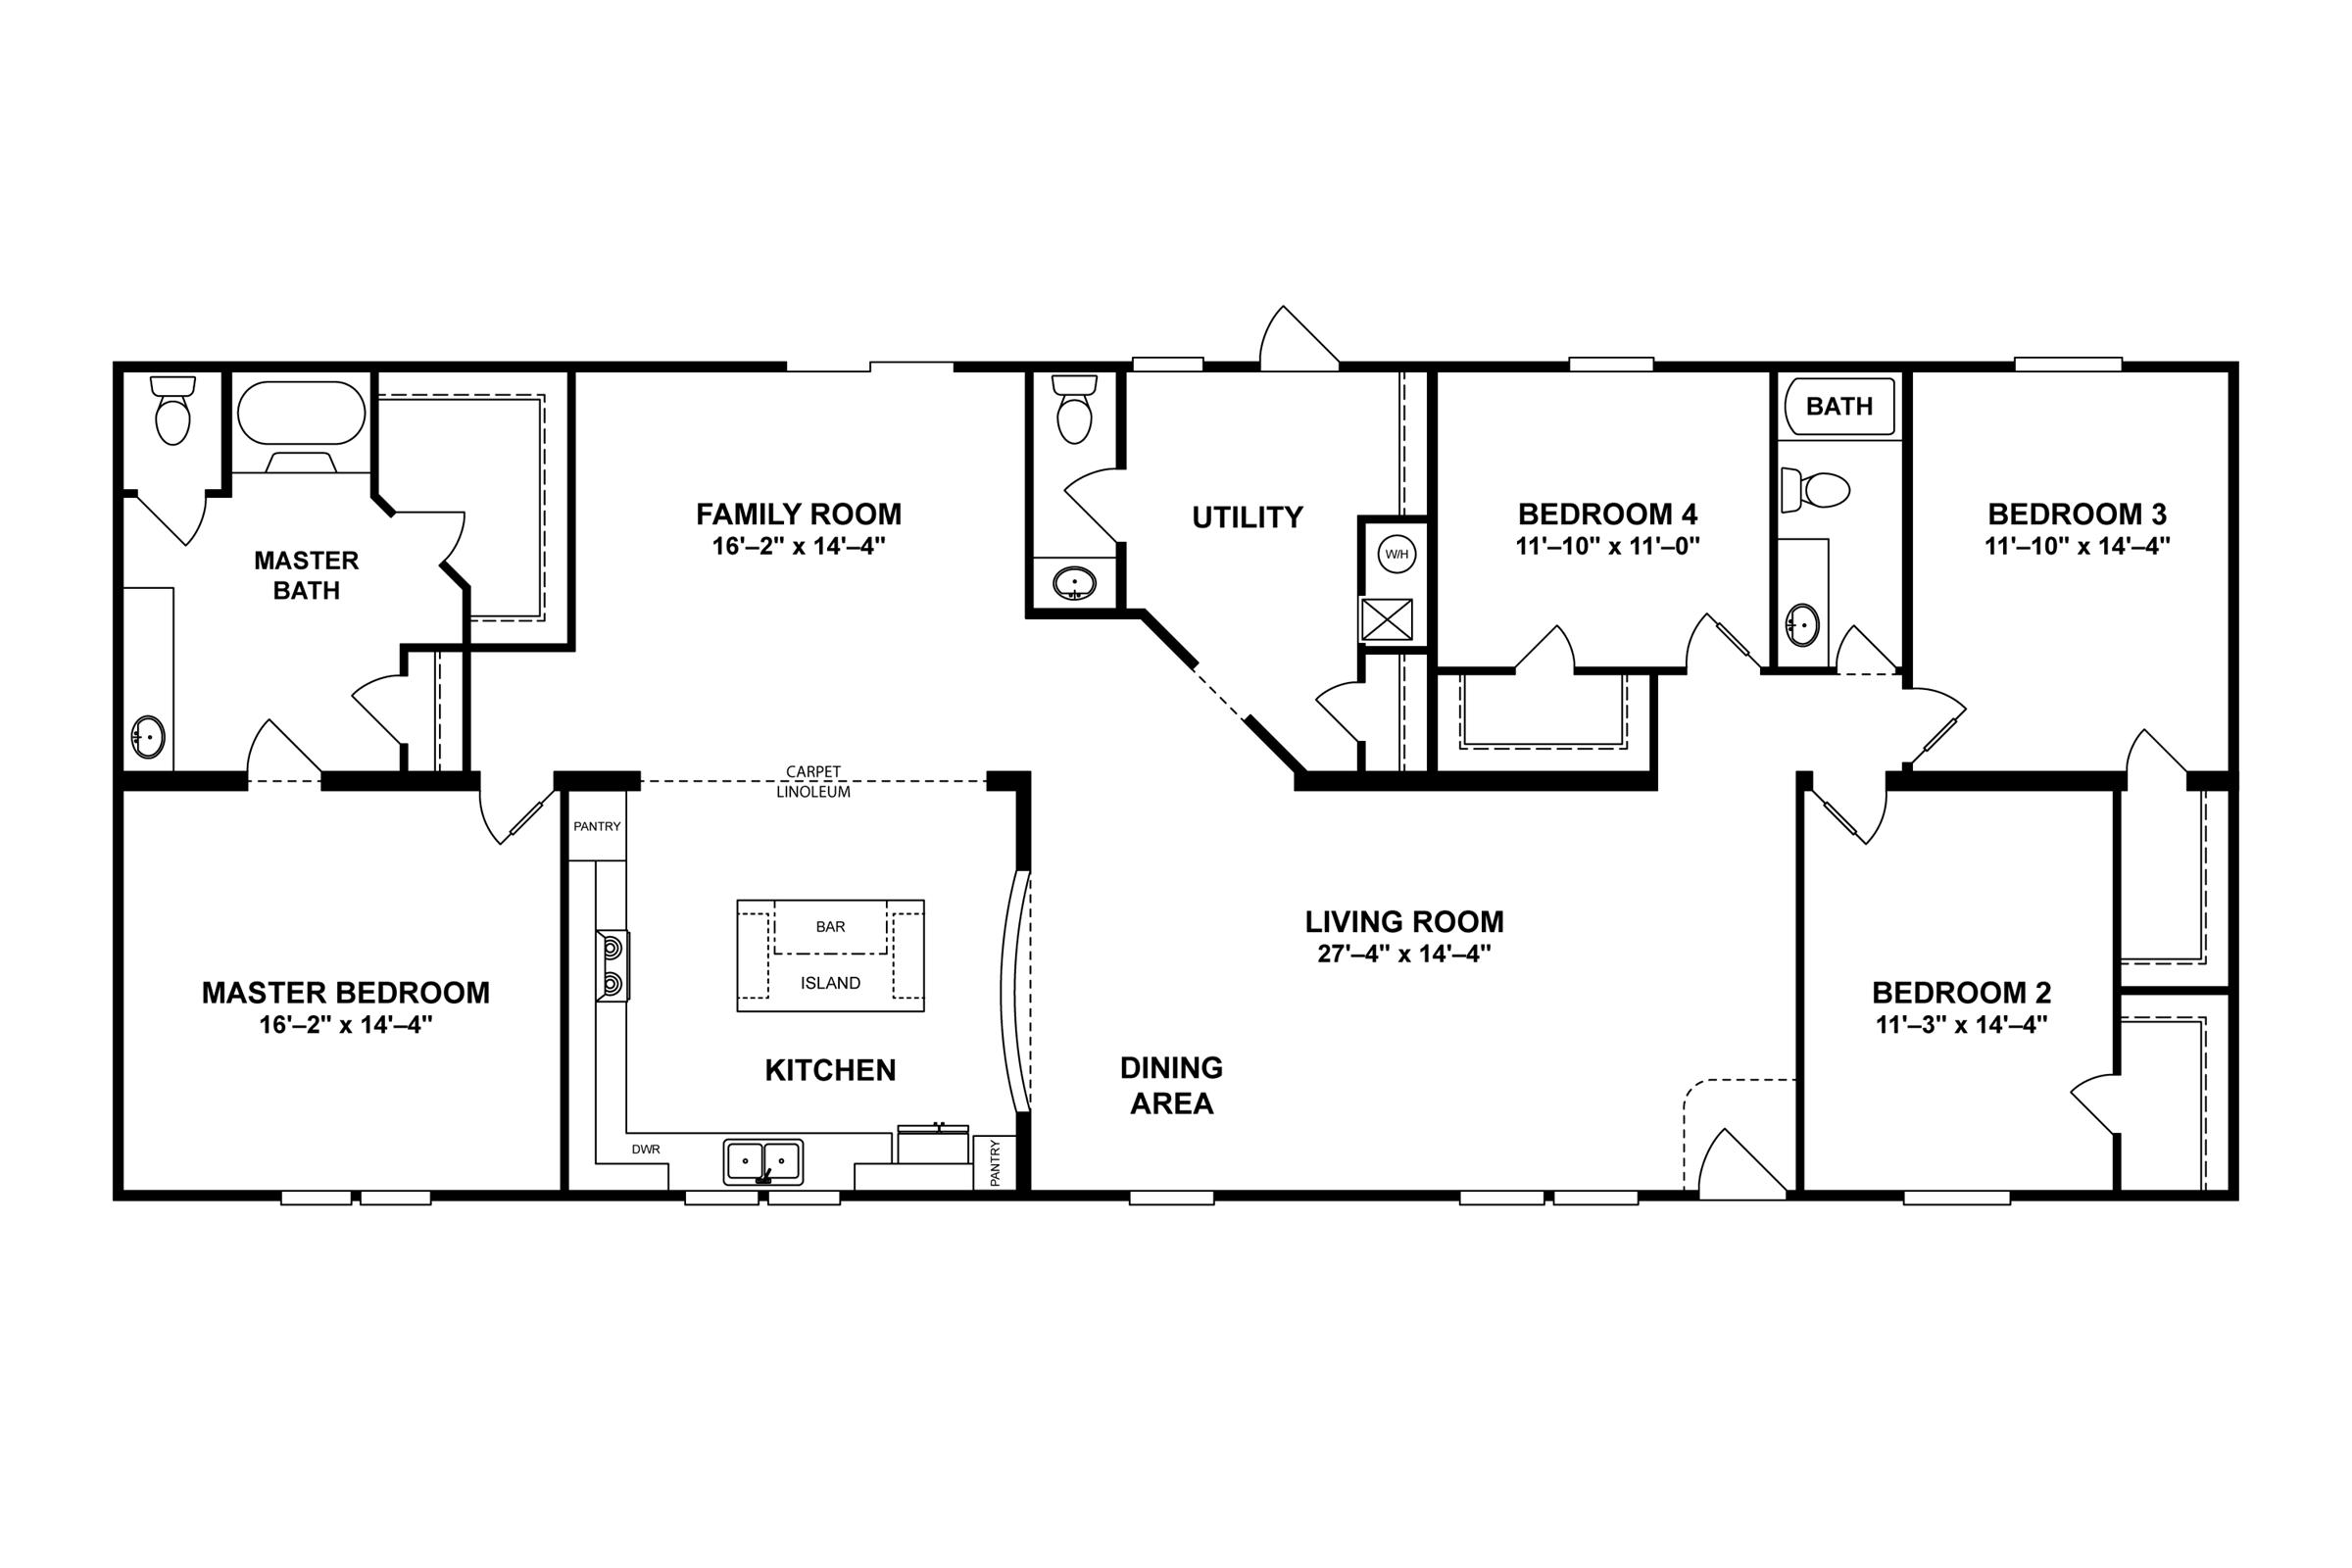 Manufactured Mobile Home Palmetto 6101 32x76 76cbg32764ah Floor Plan Modular Home Plans Mobile Home Floor Plans Floor Plans